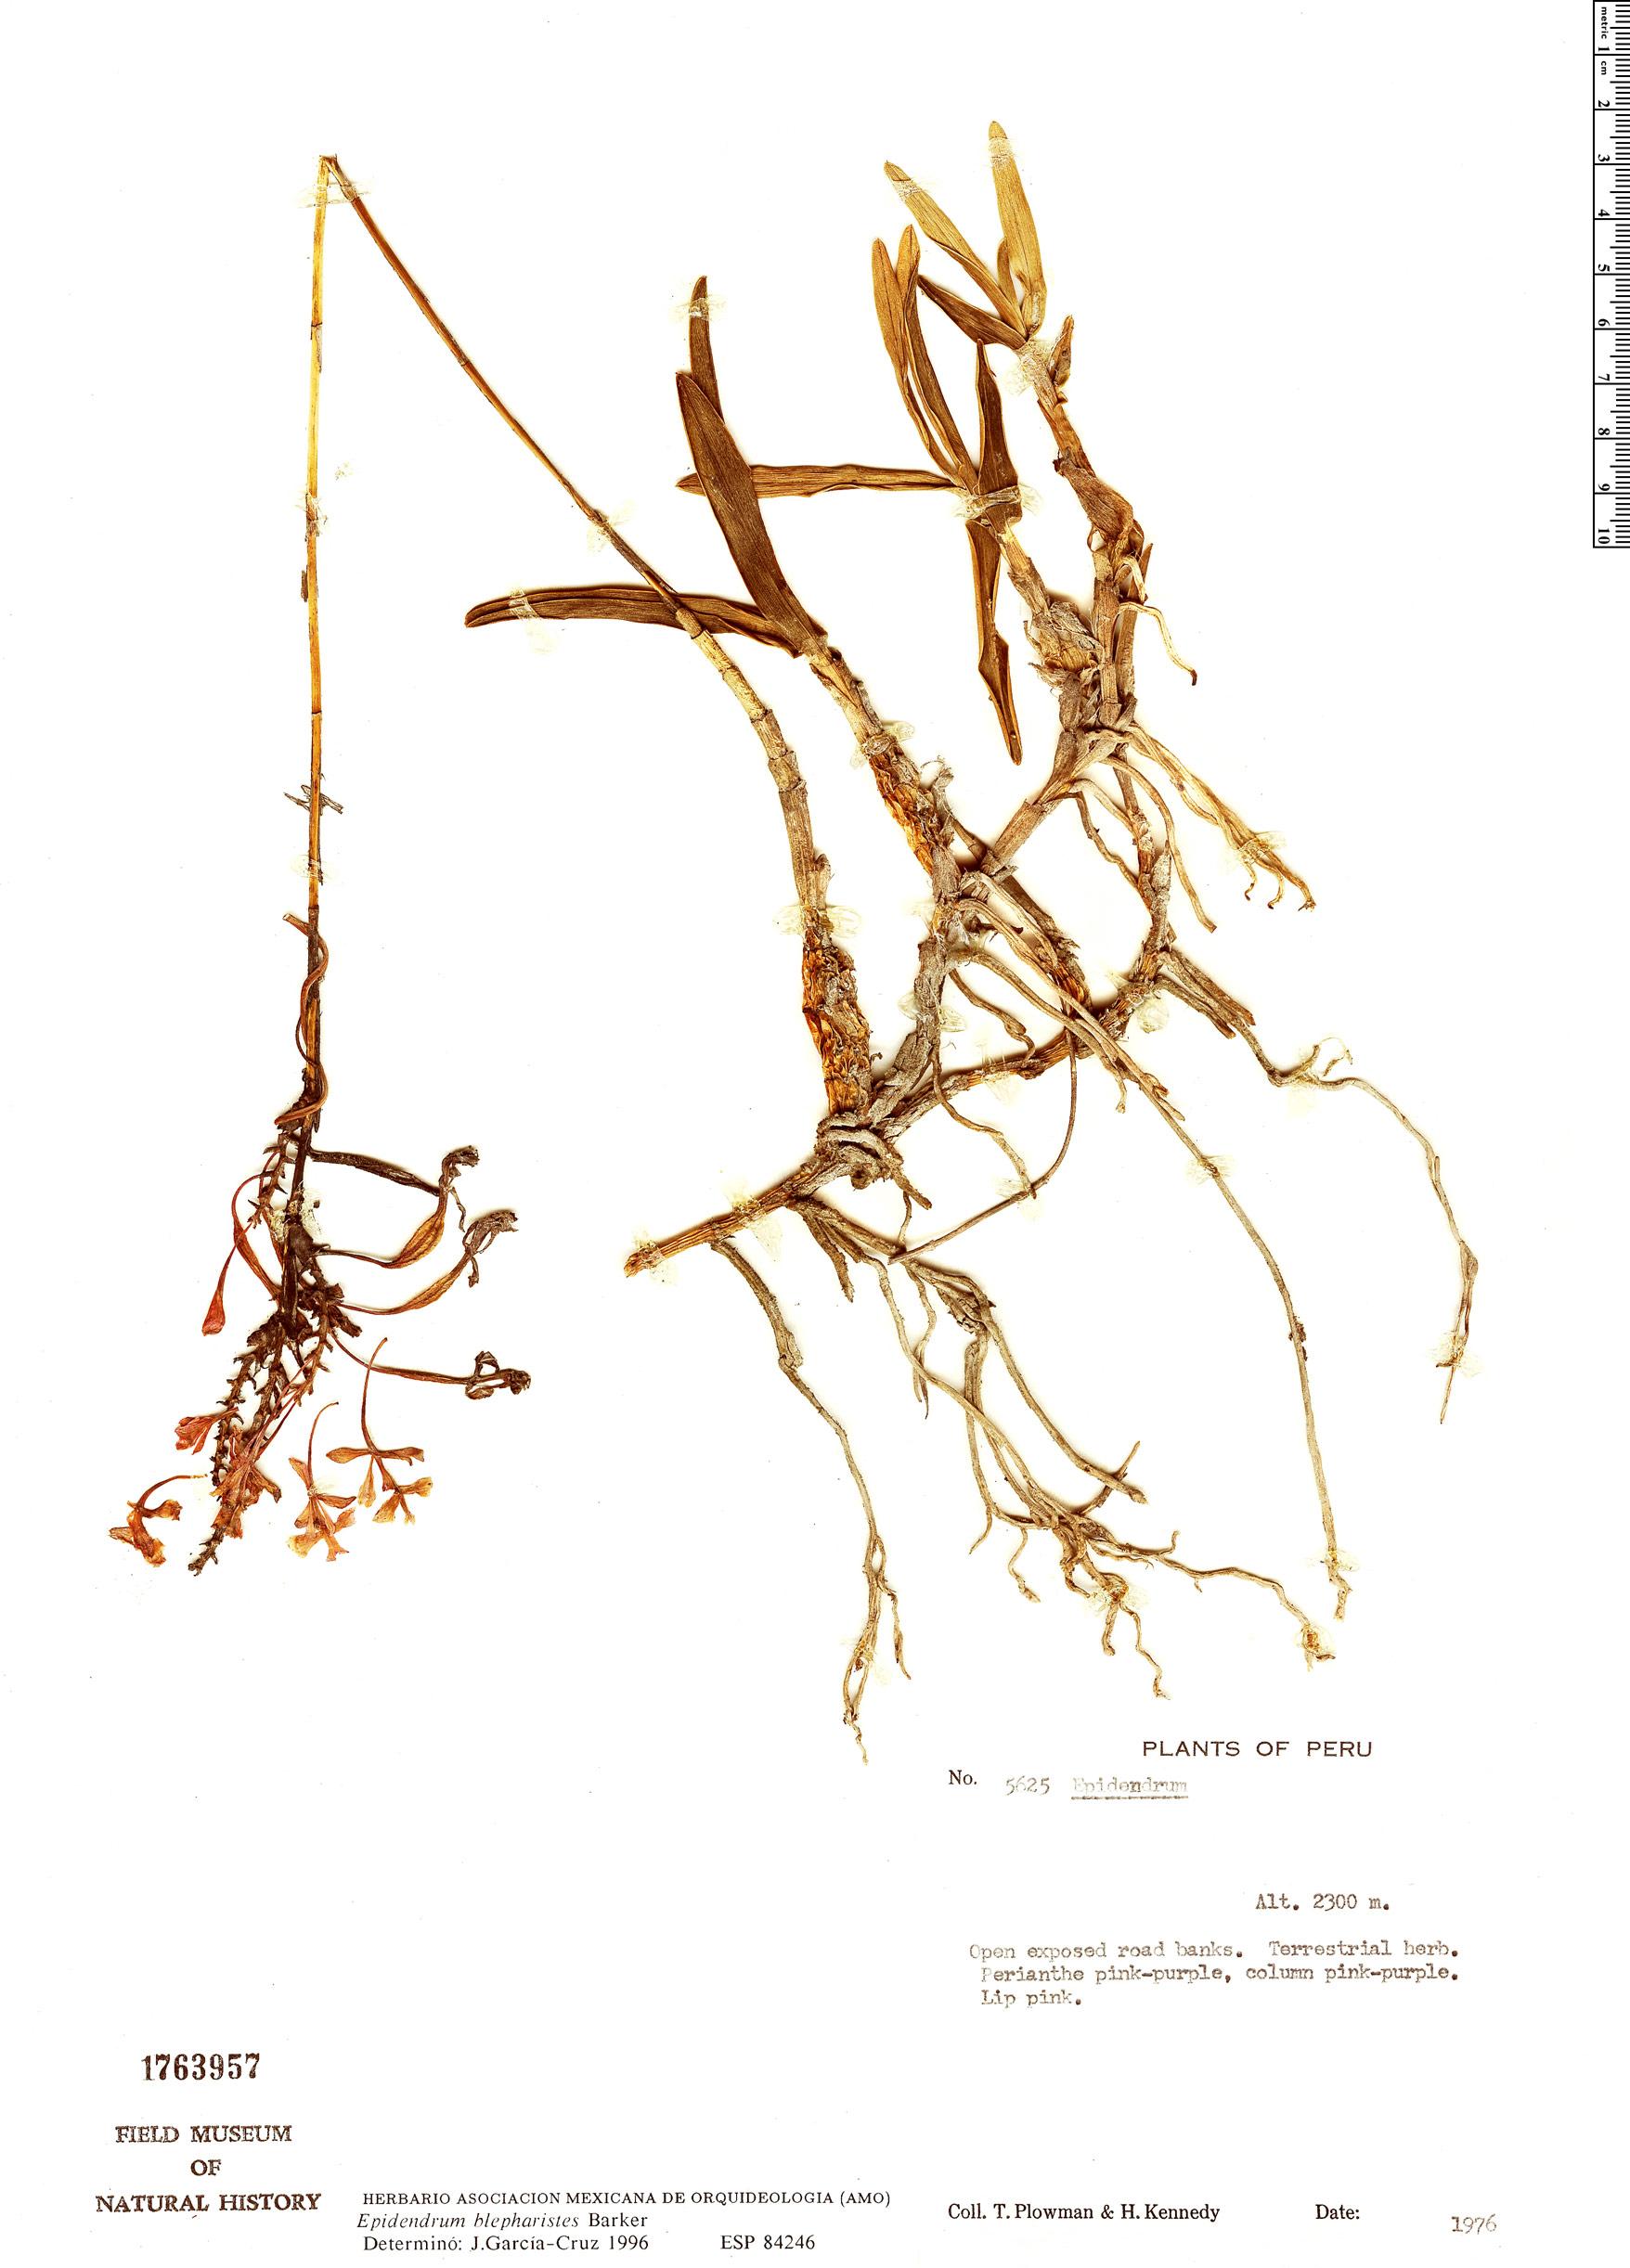 Specimen: Epidendrum blepharistes